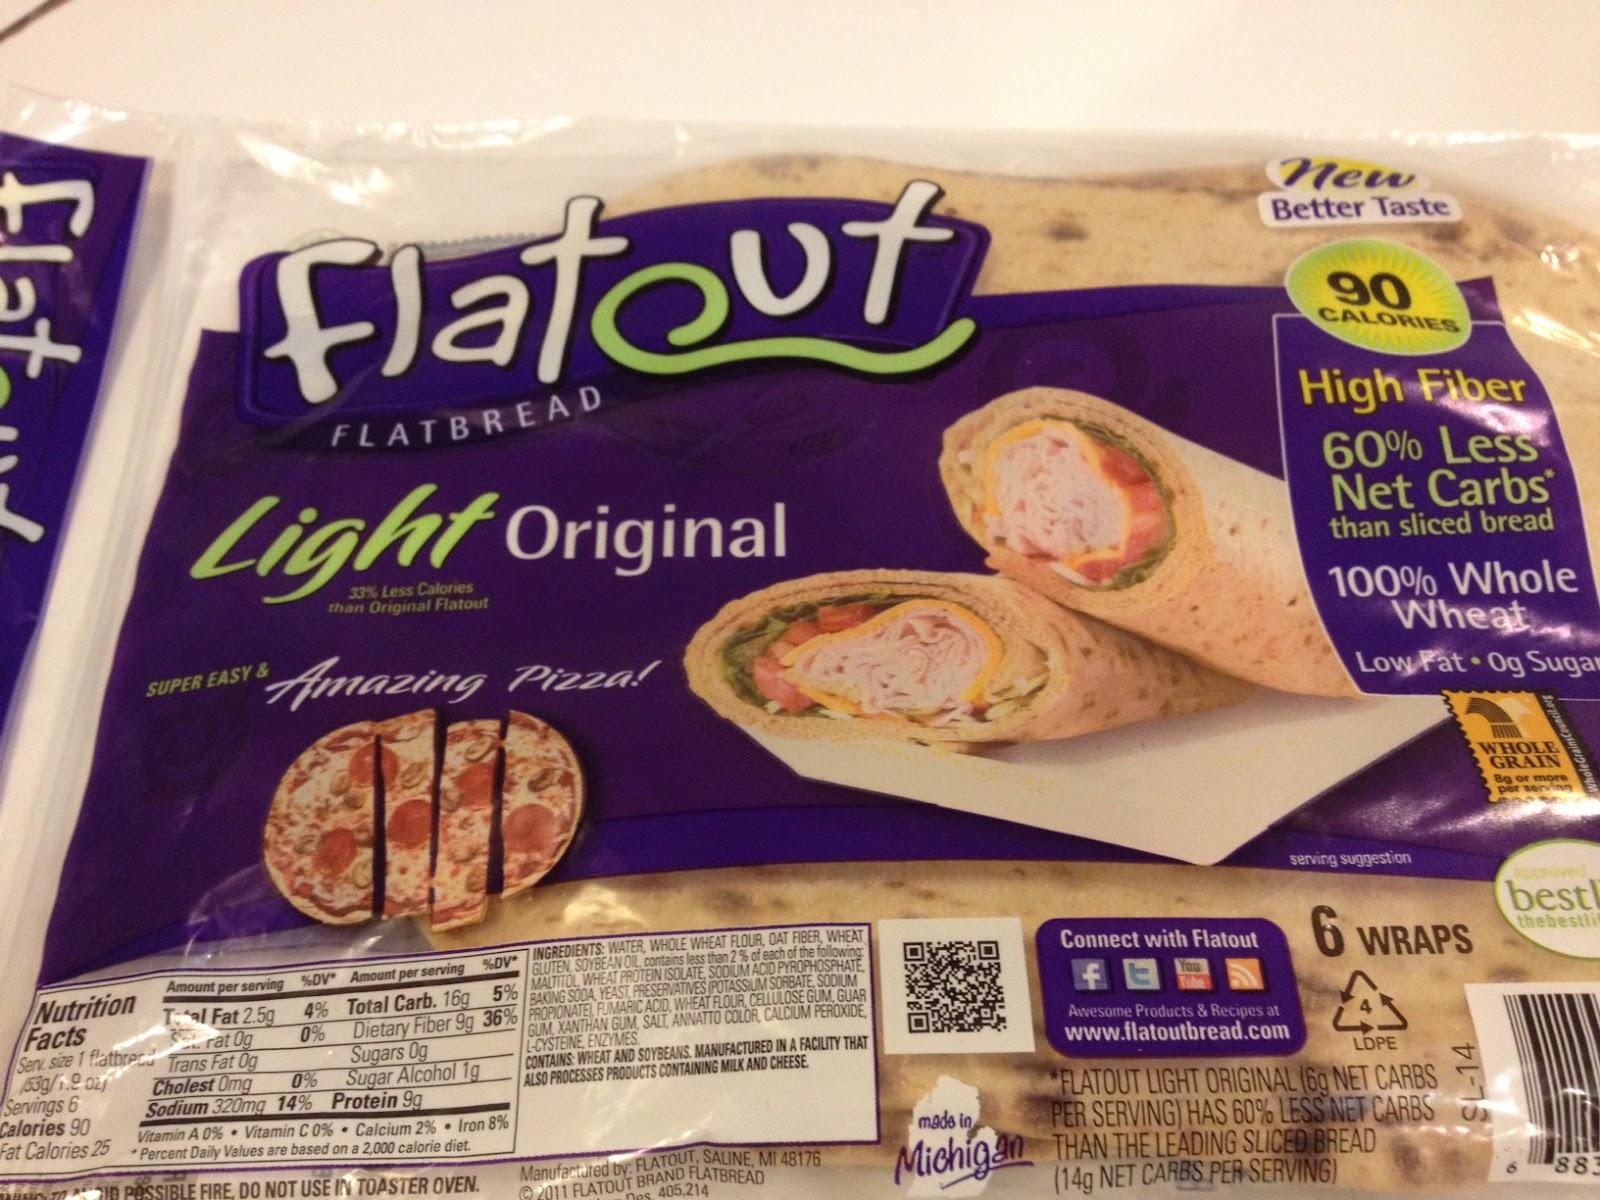 Gastricsleeve4me Fave Alert Flatout Bread